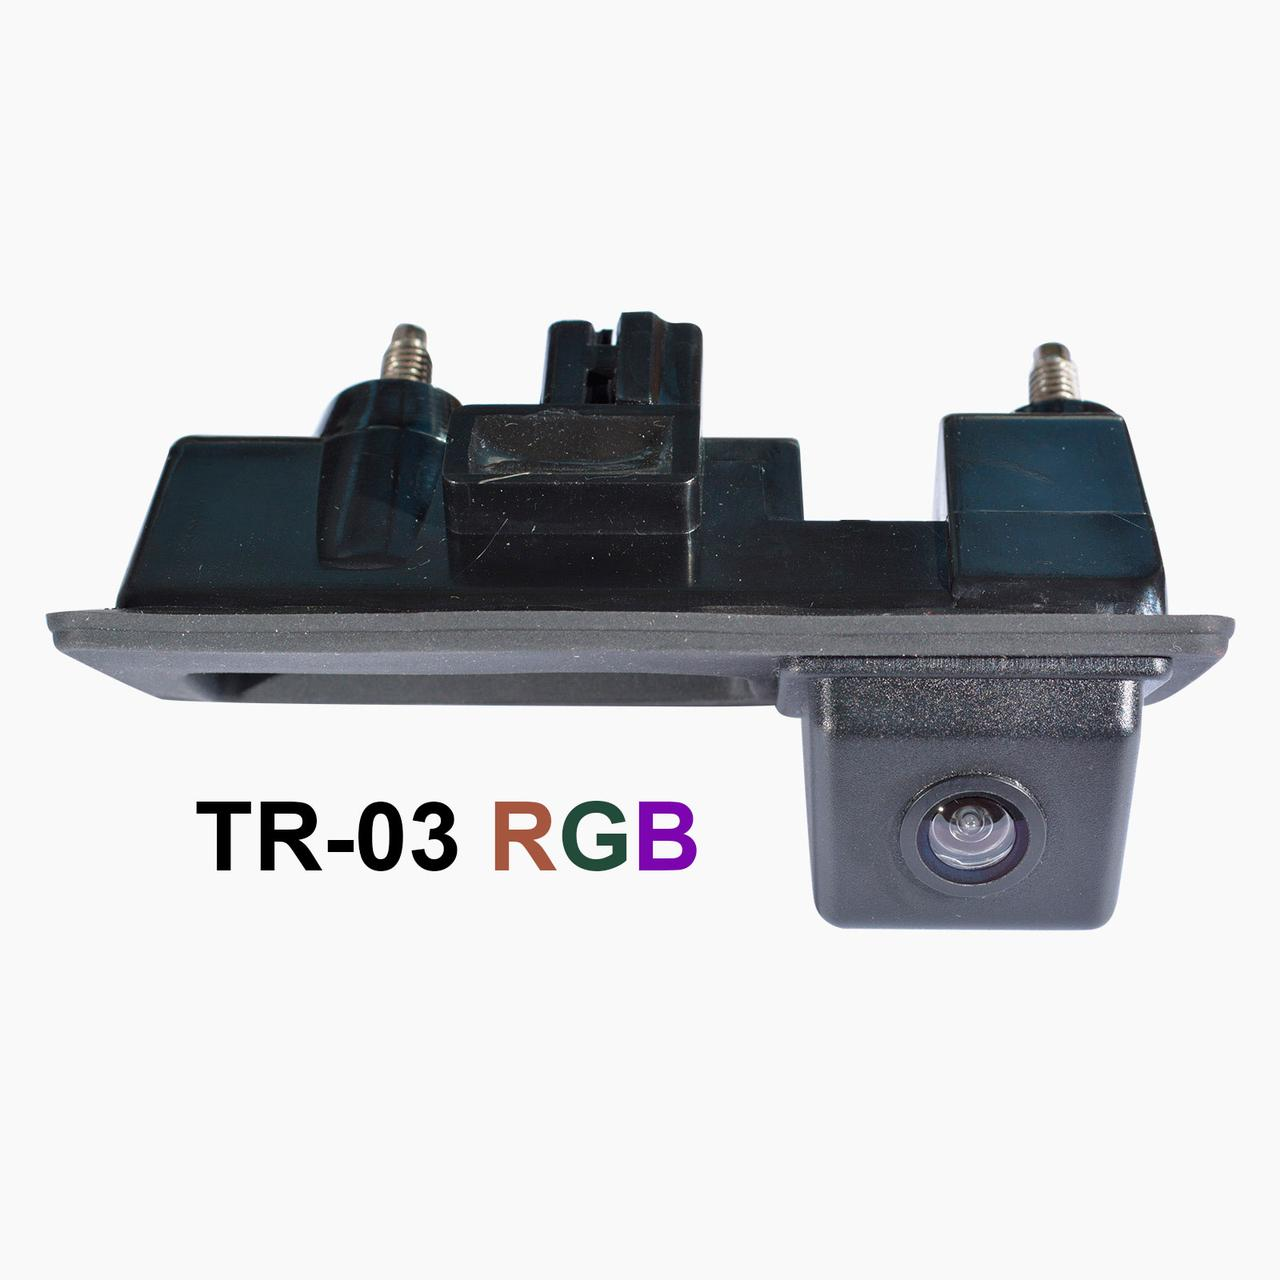 «Prime-X» TR-03 RGB Камера в ручку багажника AUDI, PORSCHE, VOLKSWAGEN